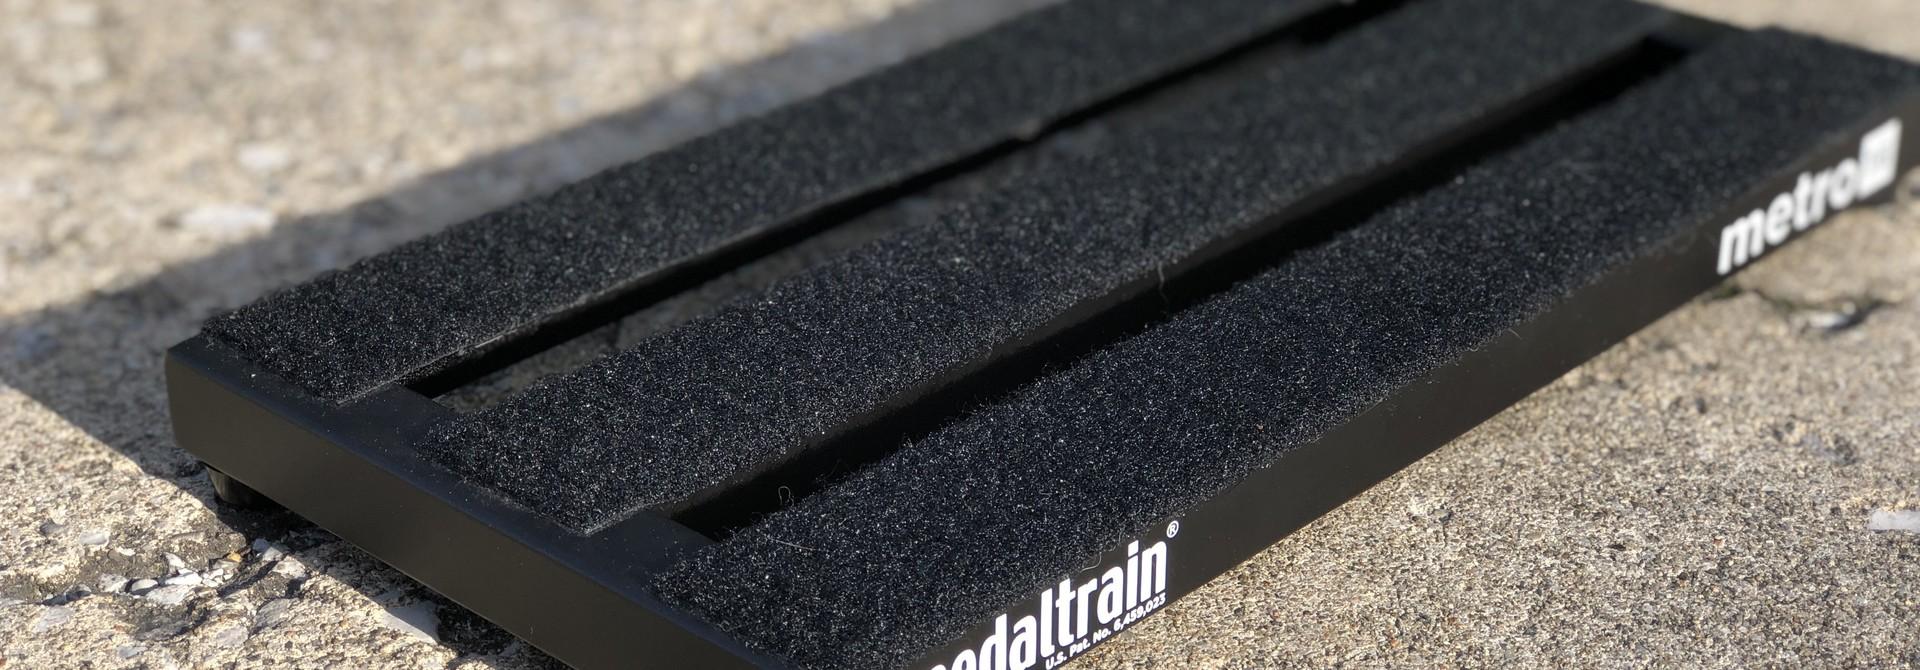 Pedaltrain Metro 16 w/softbag